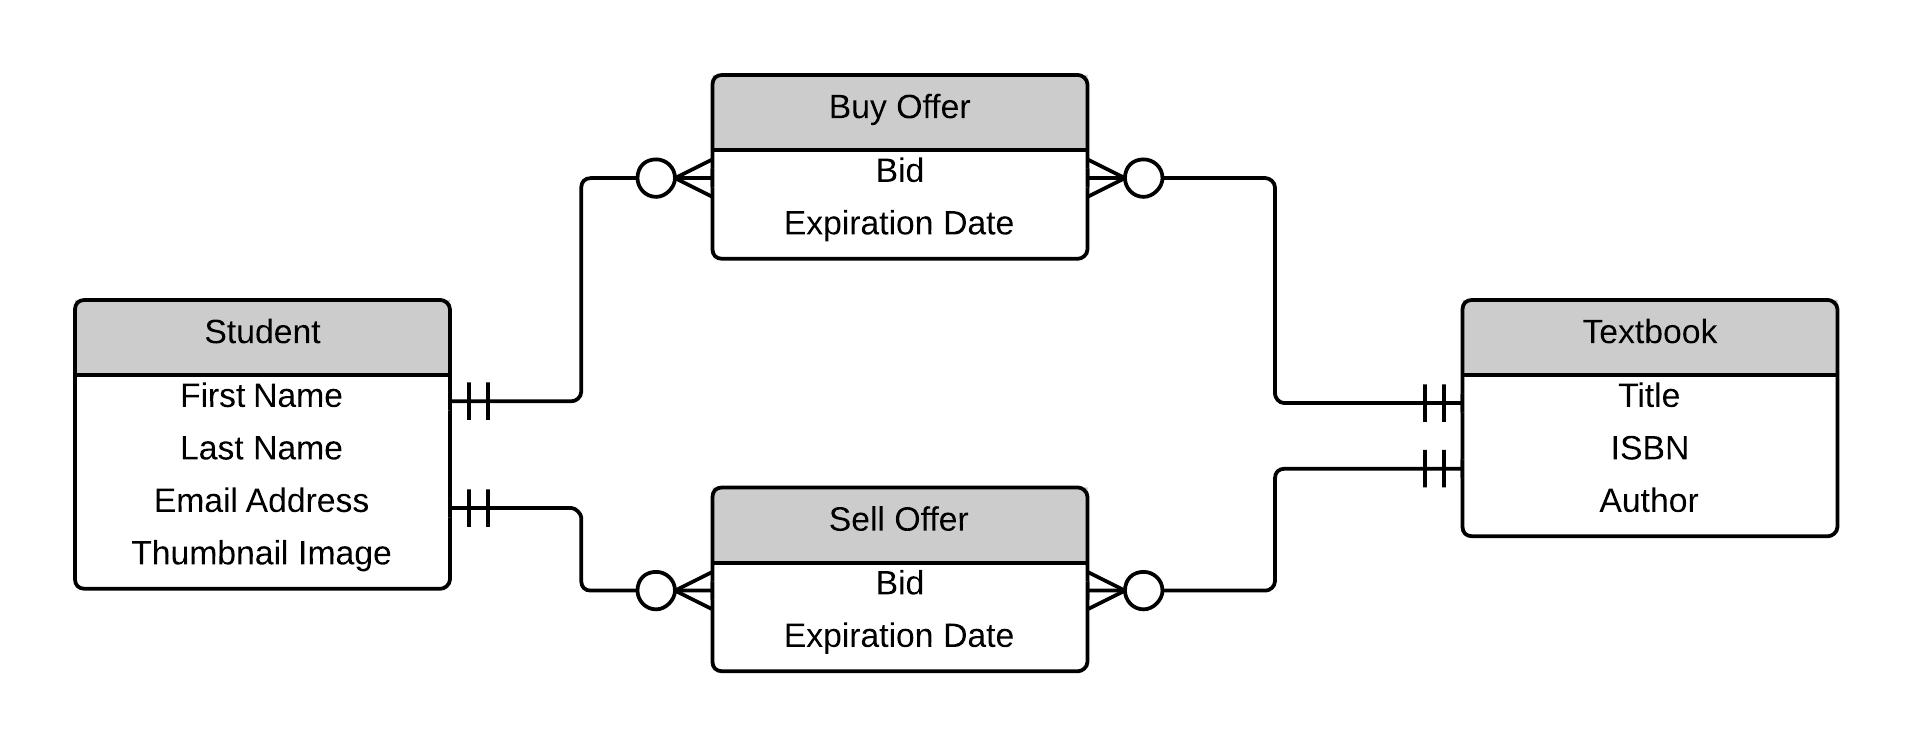 Textbook Mania Er Diagram Wod | Evan Komiyama in Er Diagram Examples Simple